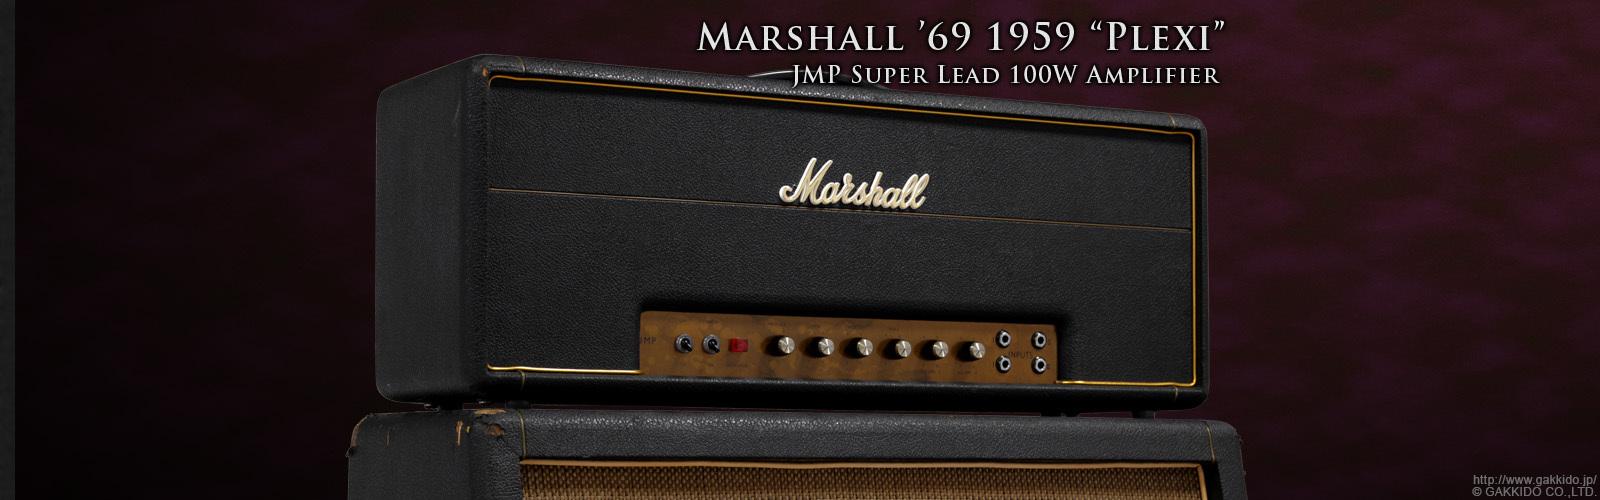 Marshall 1968 1959 Plexi JMP Super Lead 100W ギターアンプ ヘッド #122XX [中古品]